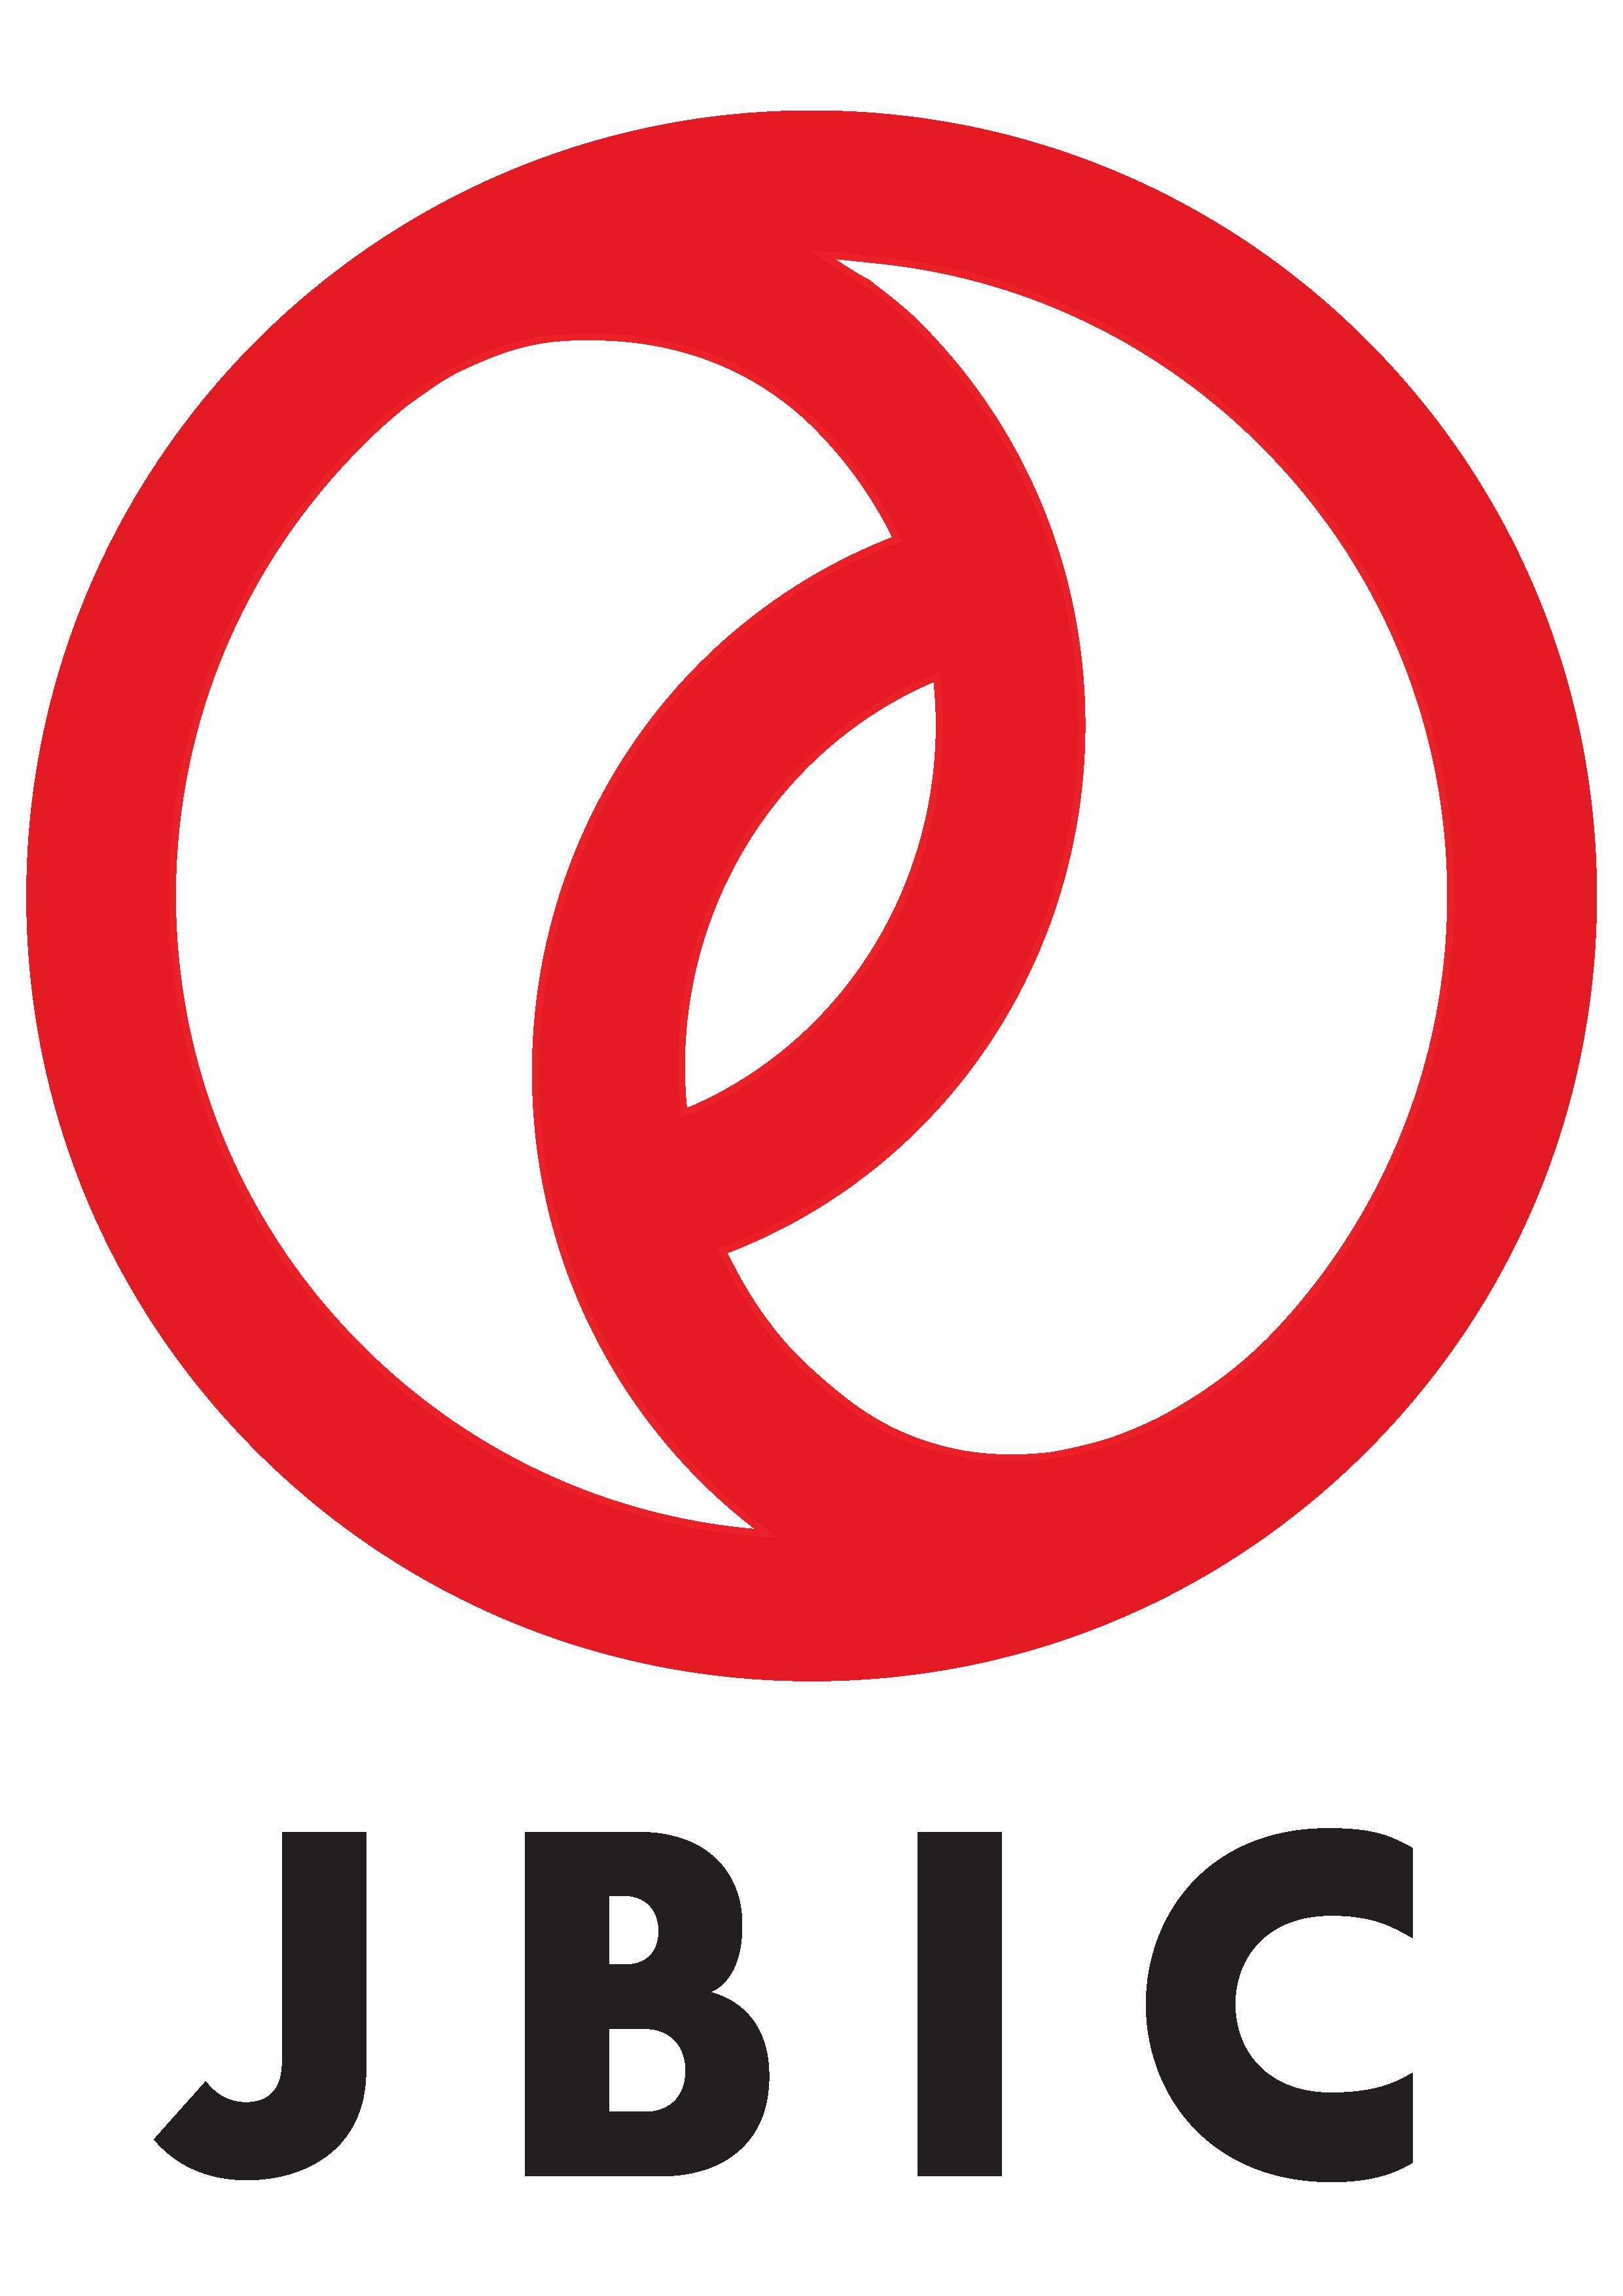 JBIC logo transparent.png